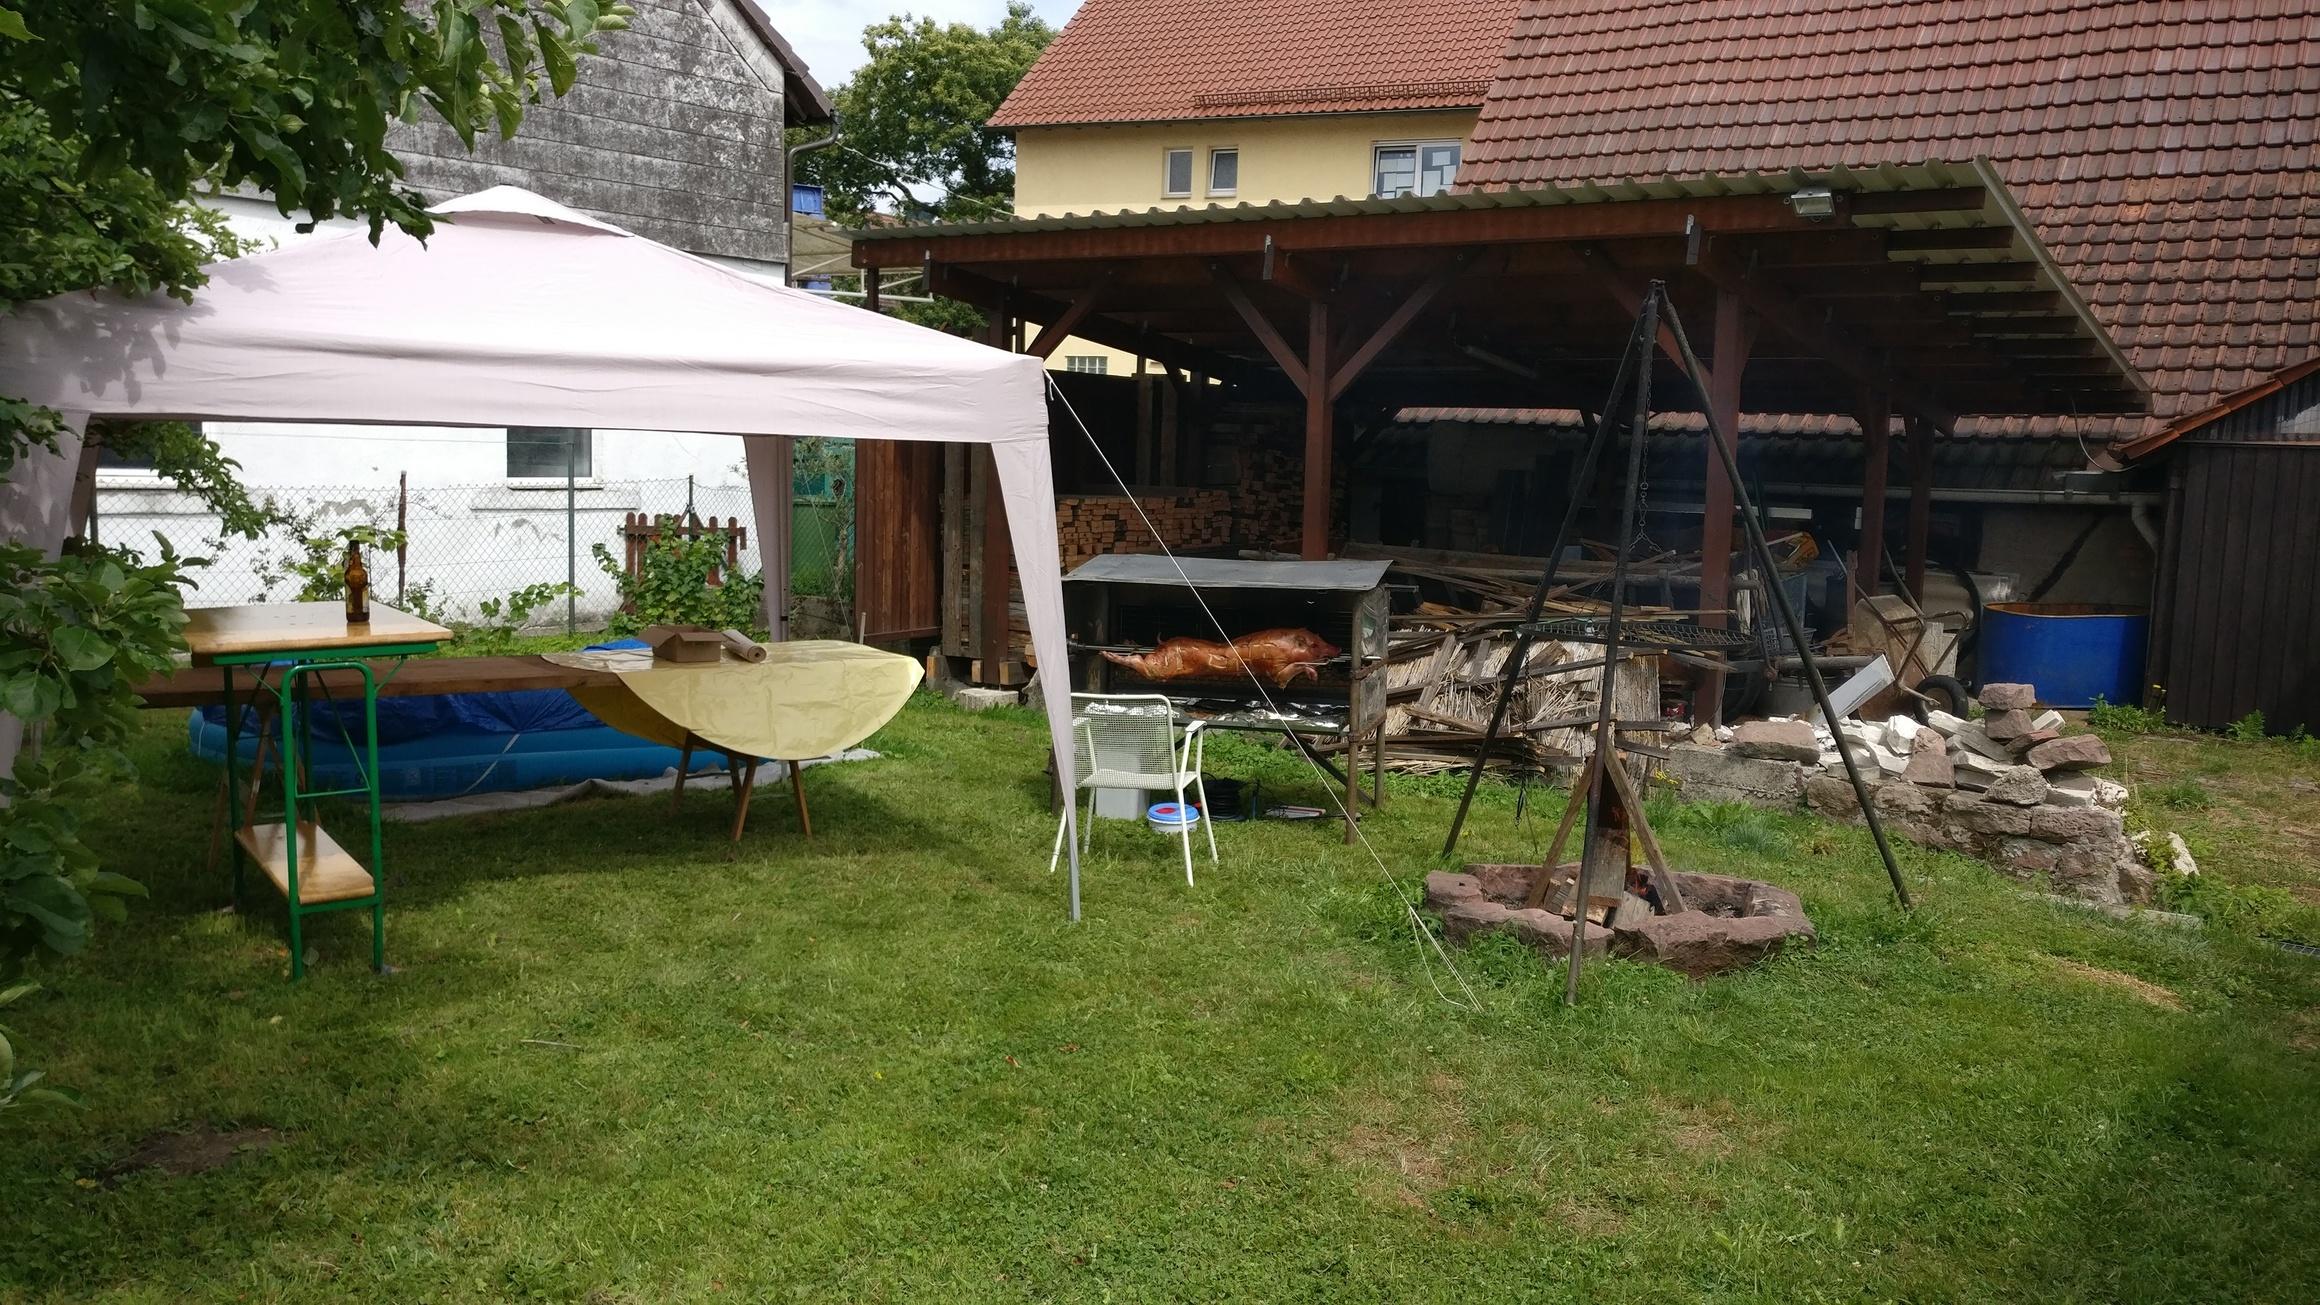 Spanferkel Grillen am 01.07.2017